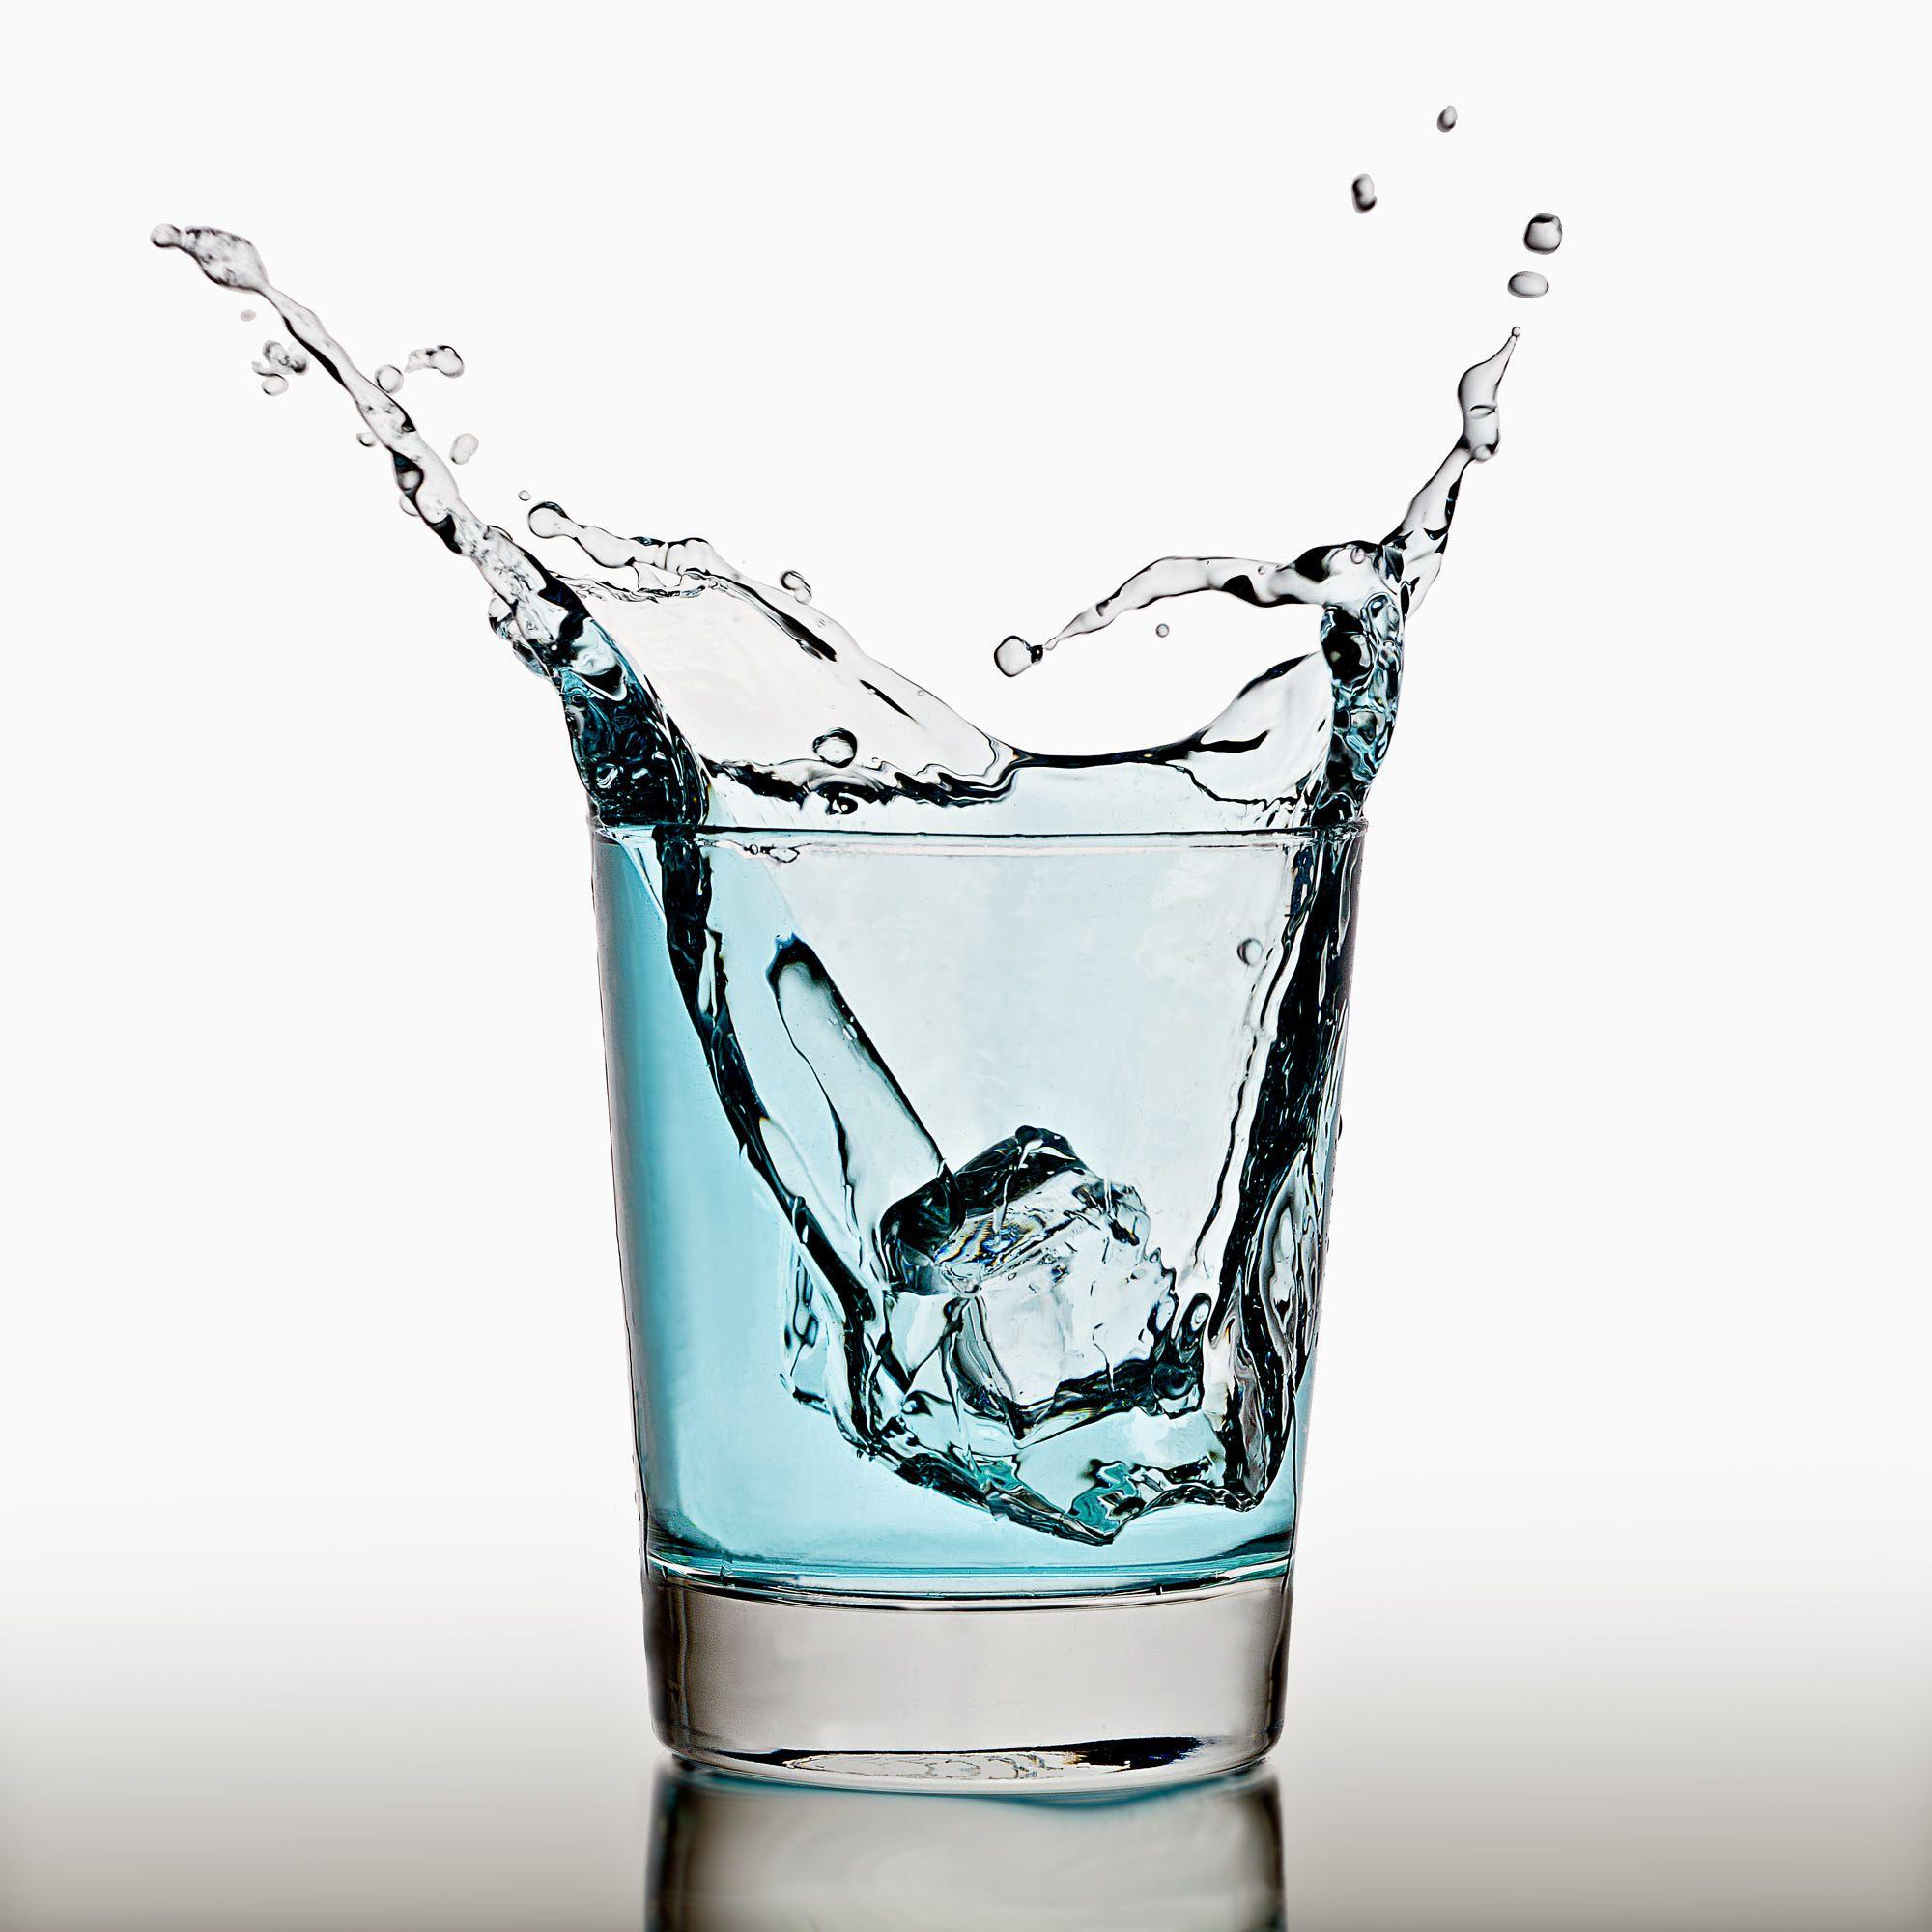 Ice Cube Splashing In A Cool Glass Of Water 현실적인 그림 물 사진 물 유리